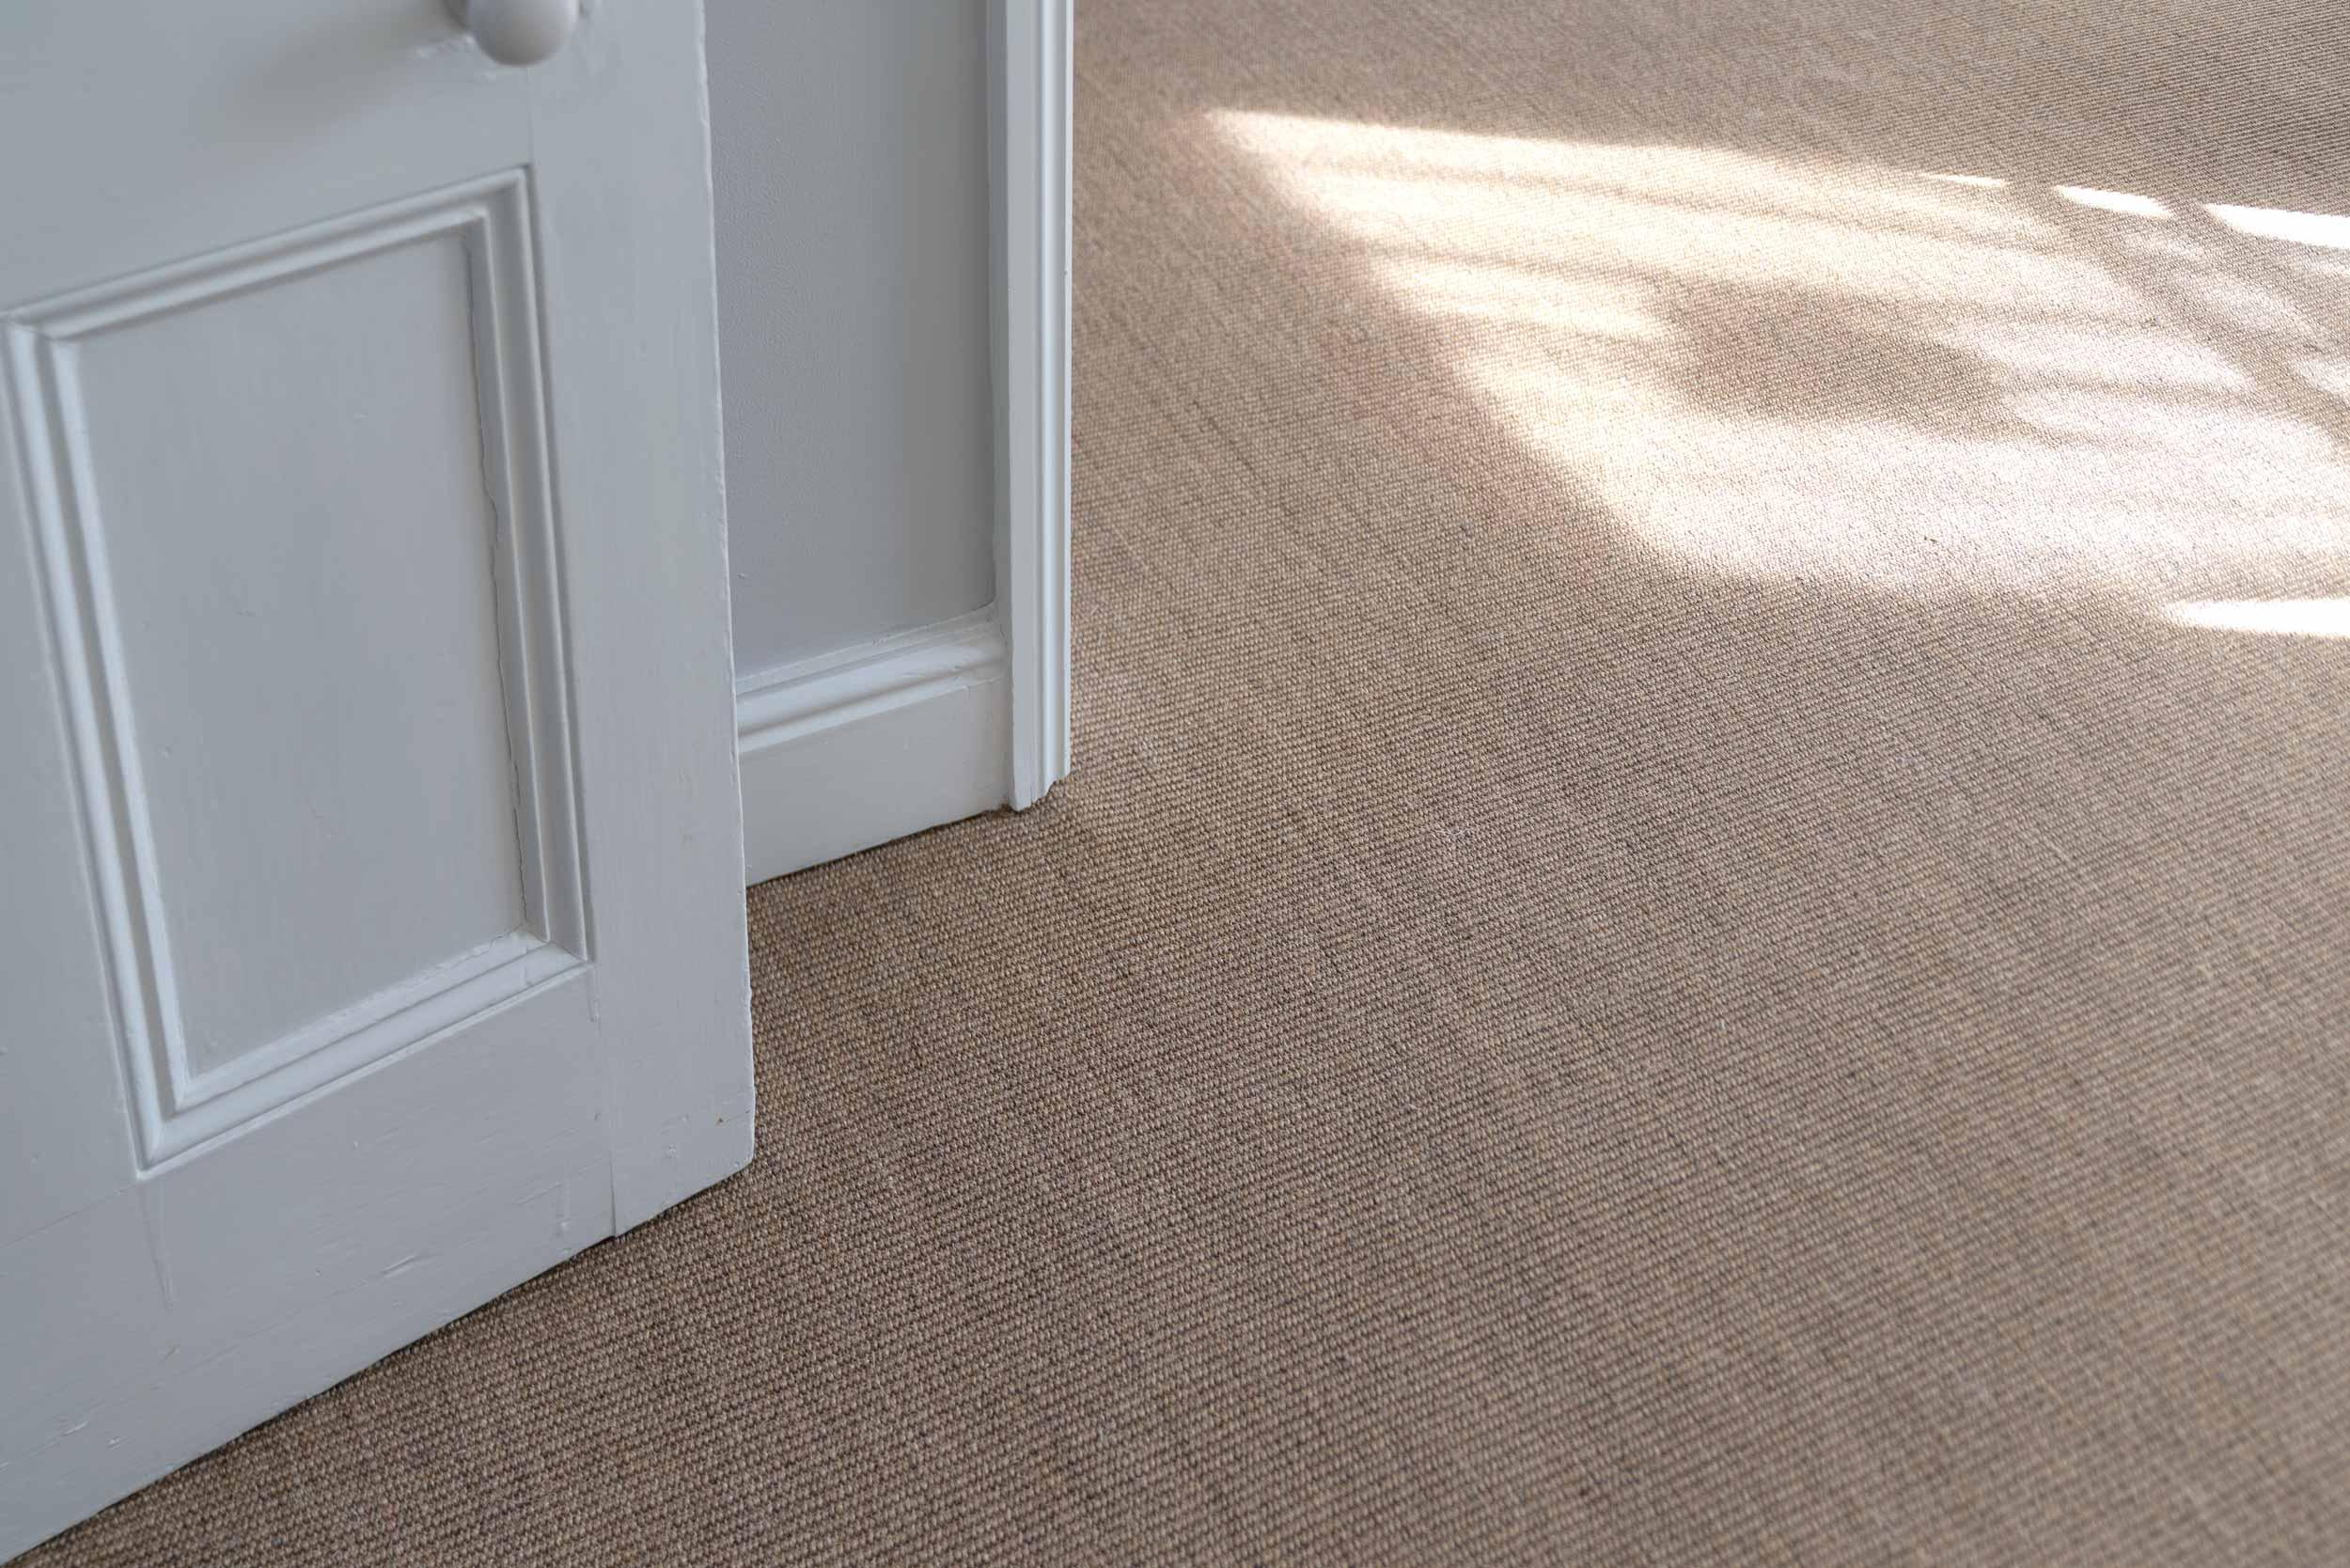 Fiona-Burrage-Photography-Caroline-Fisher-Ceramics-flooring.jpg